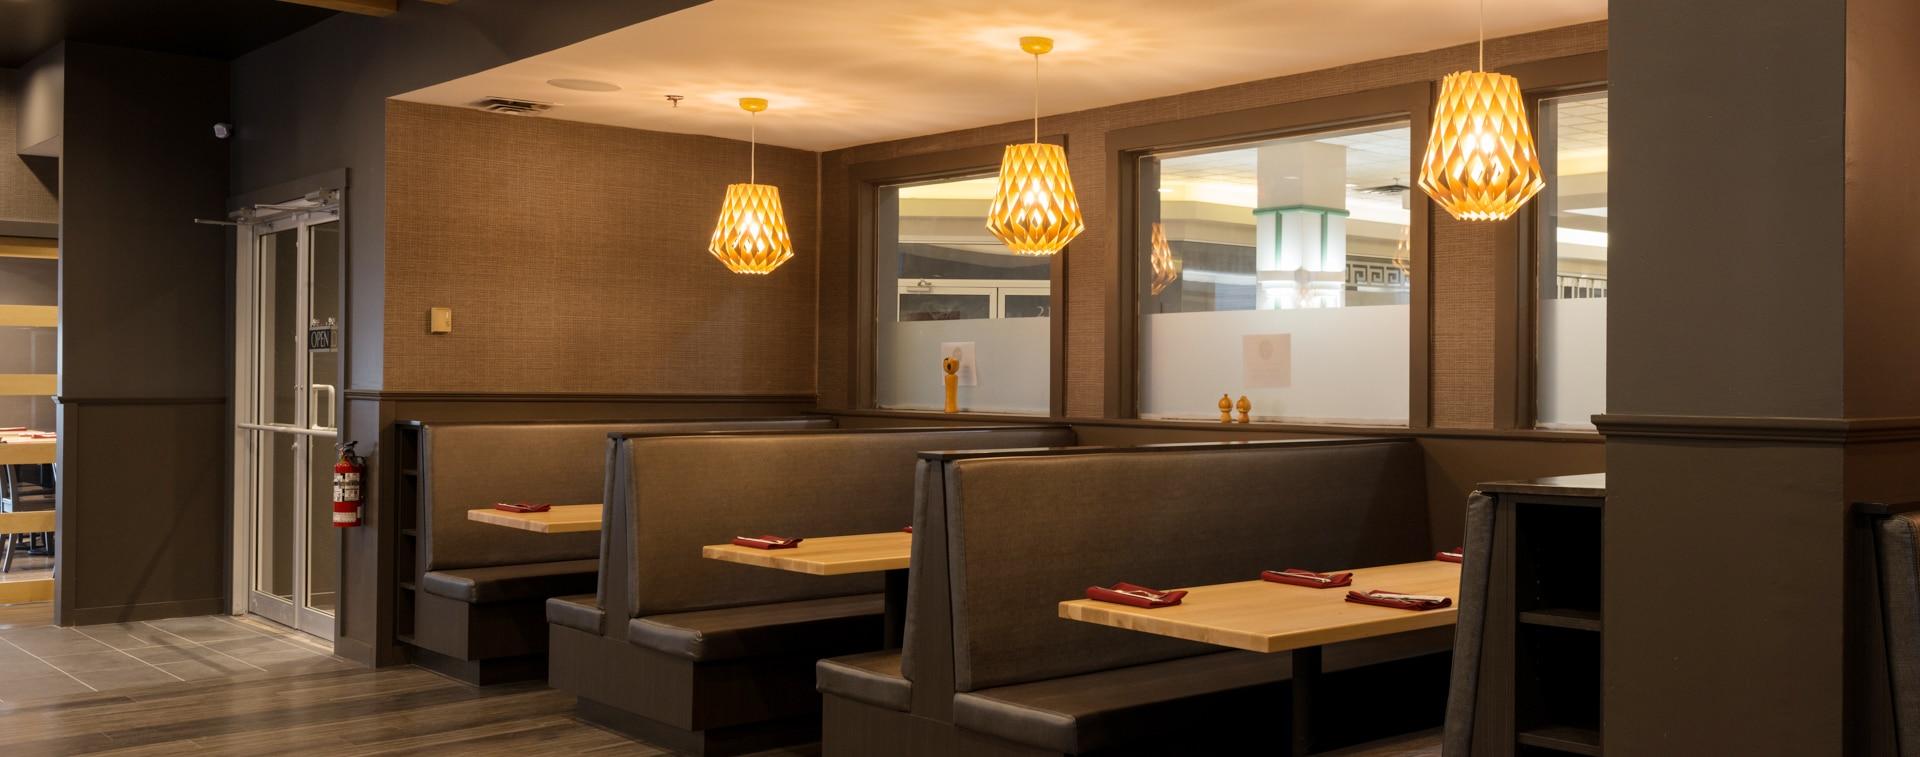 Hojo's Japanese Cuisine interior